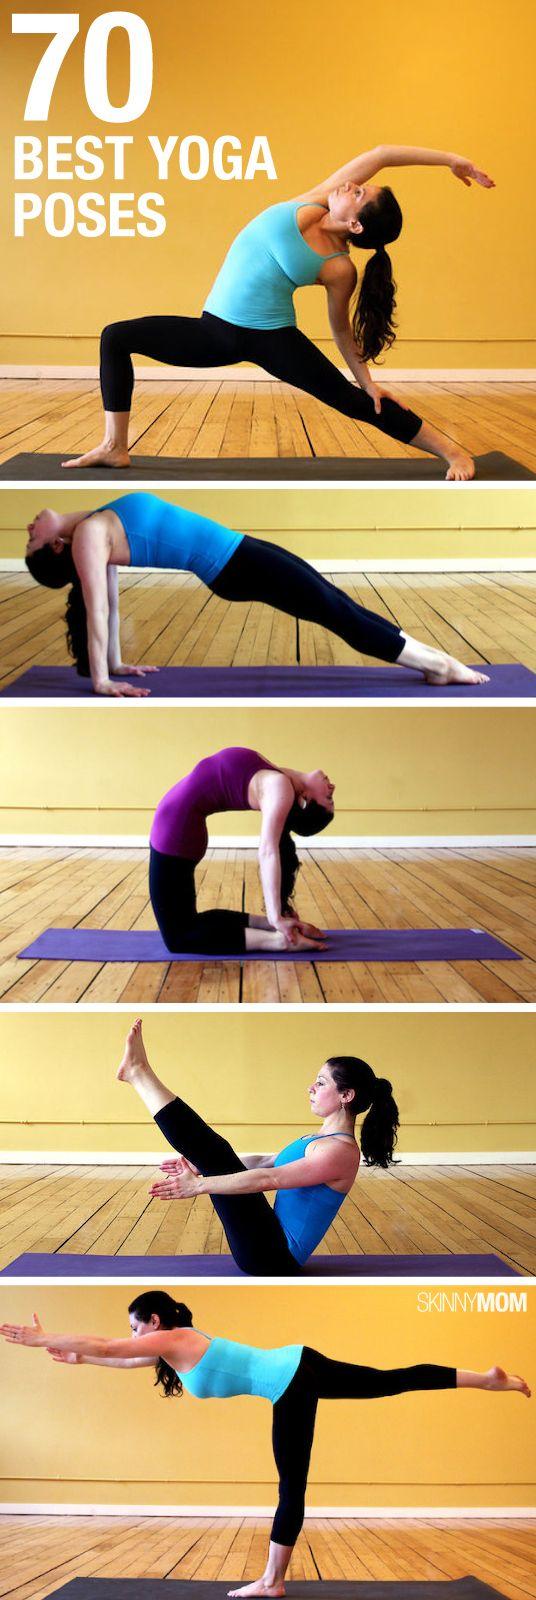 Great yoga poses! #findyouryoga #travel #yoga www.yogatraveltree.com